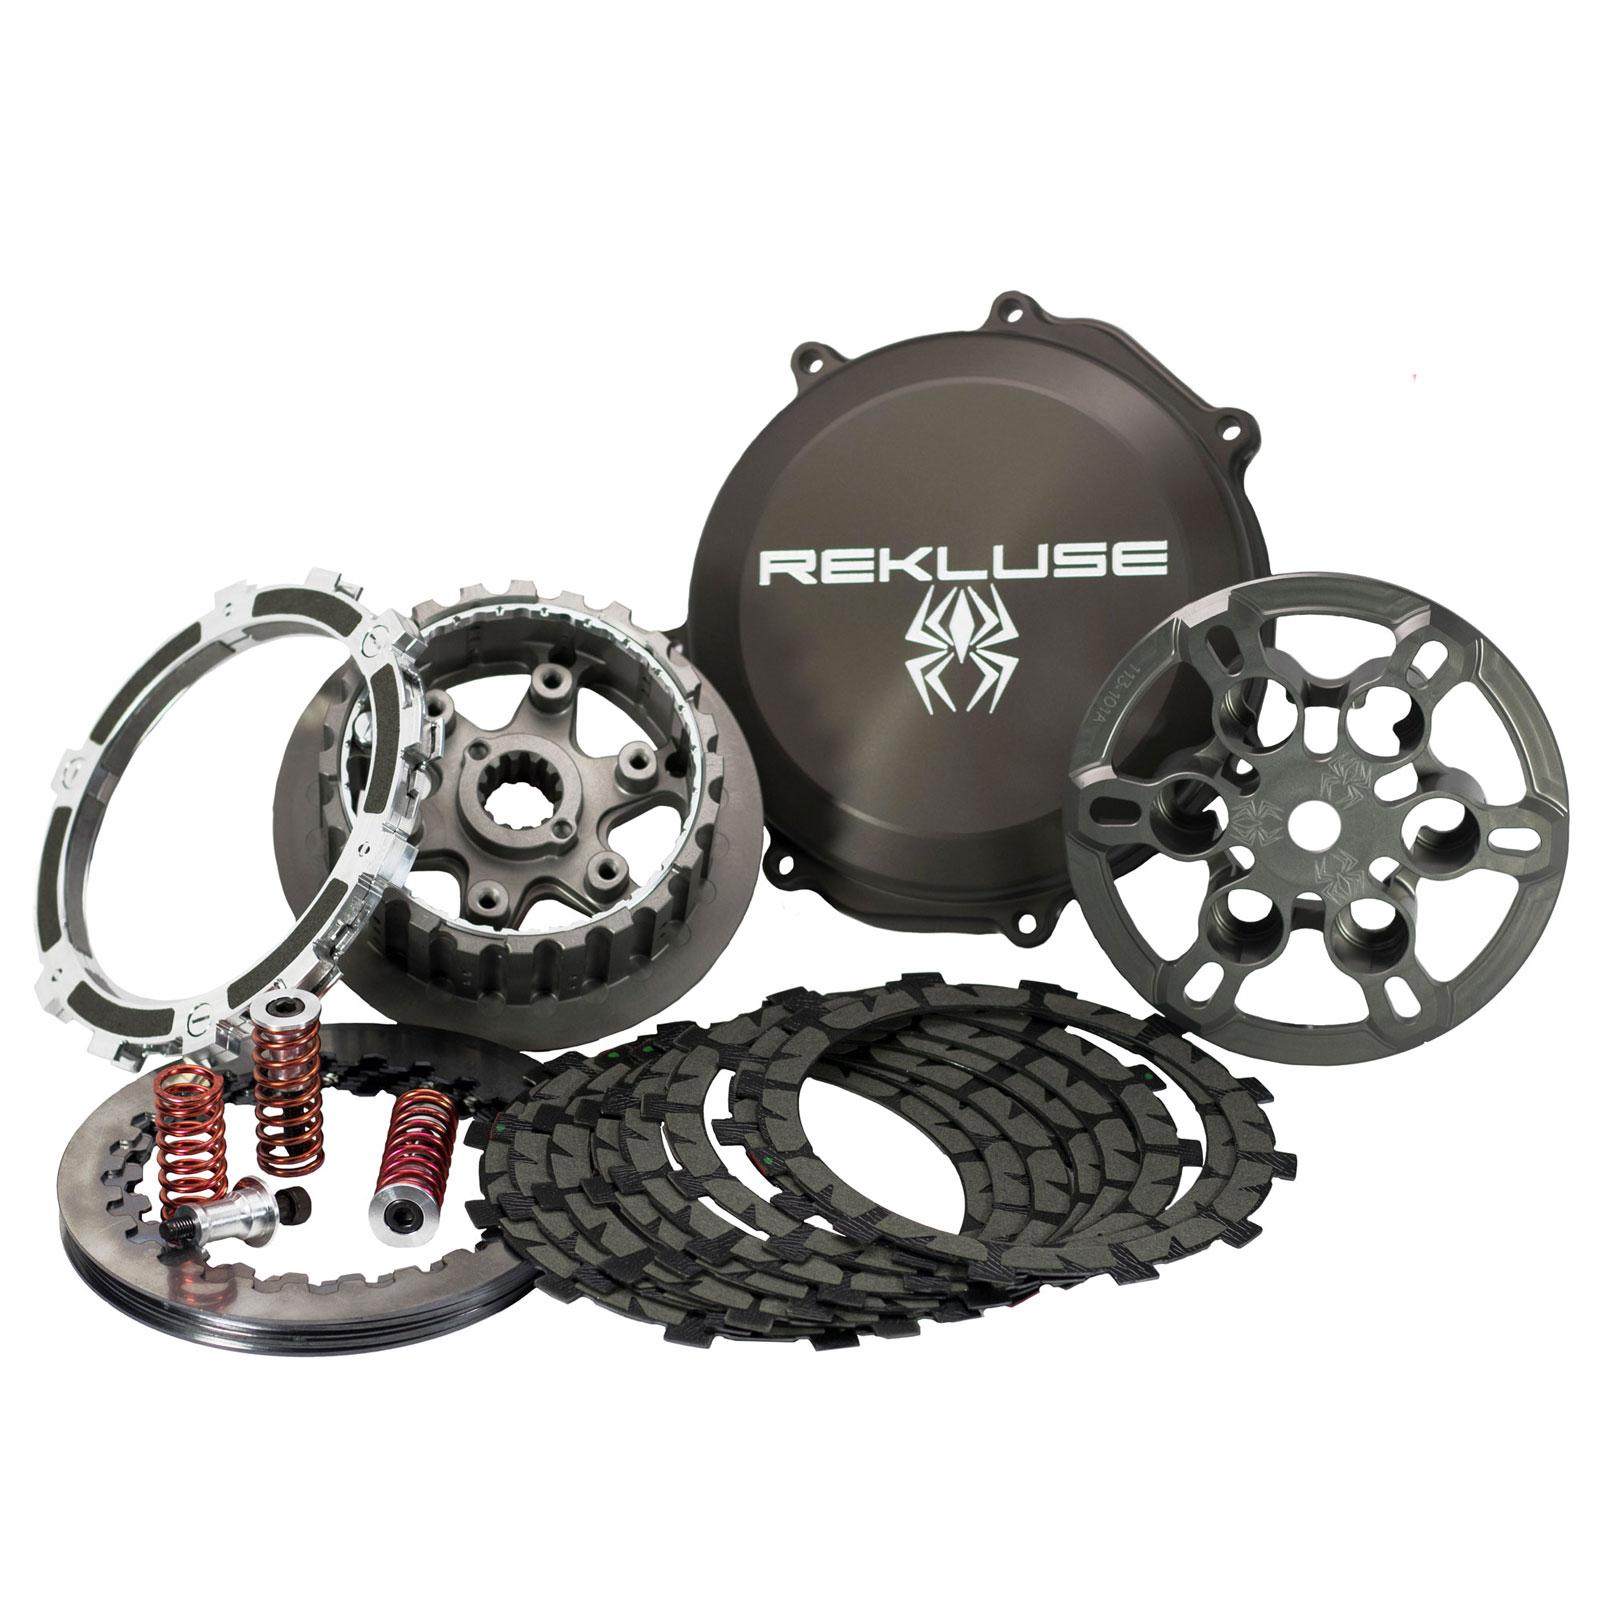 Rekluse Racing RadiusX Auto Clutch RMS-6202